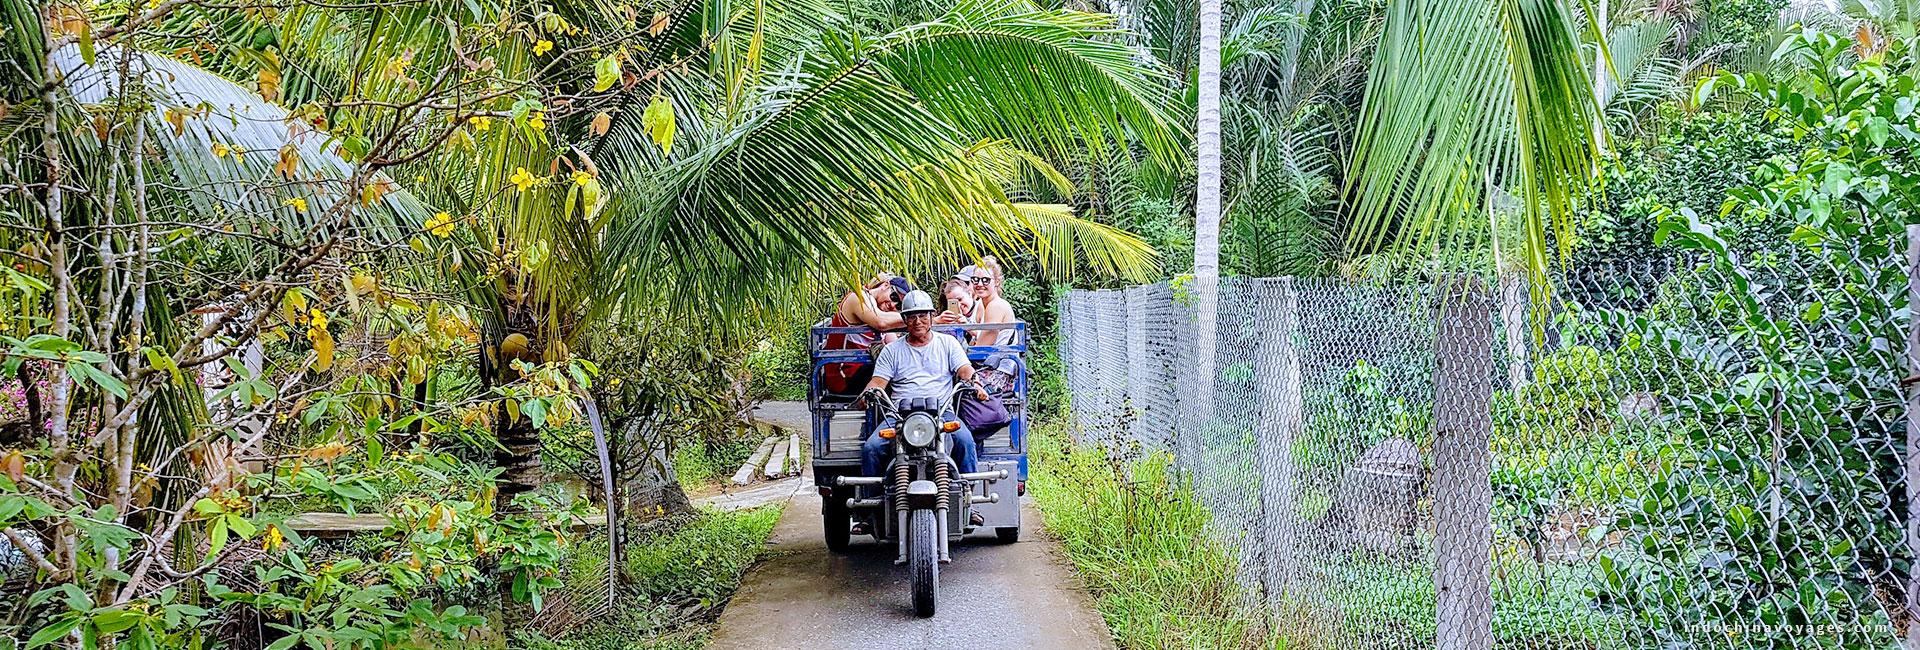 Taste of Mekong & Ho Chi Minh City 4 days